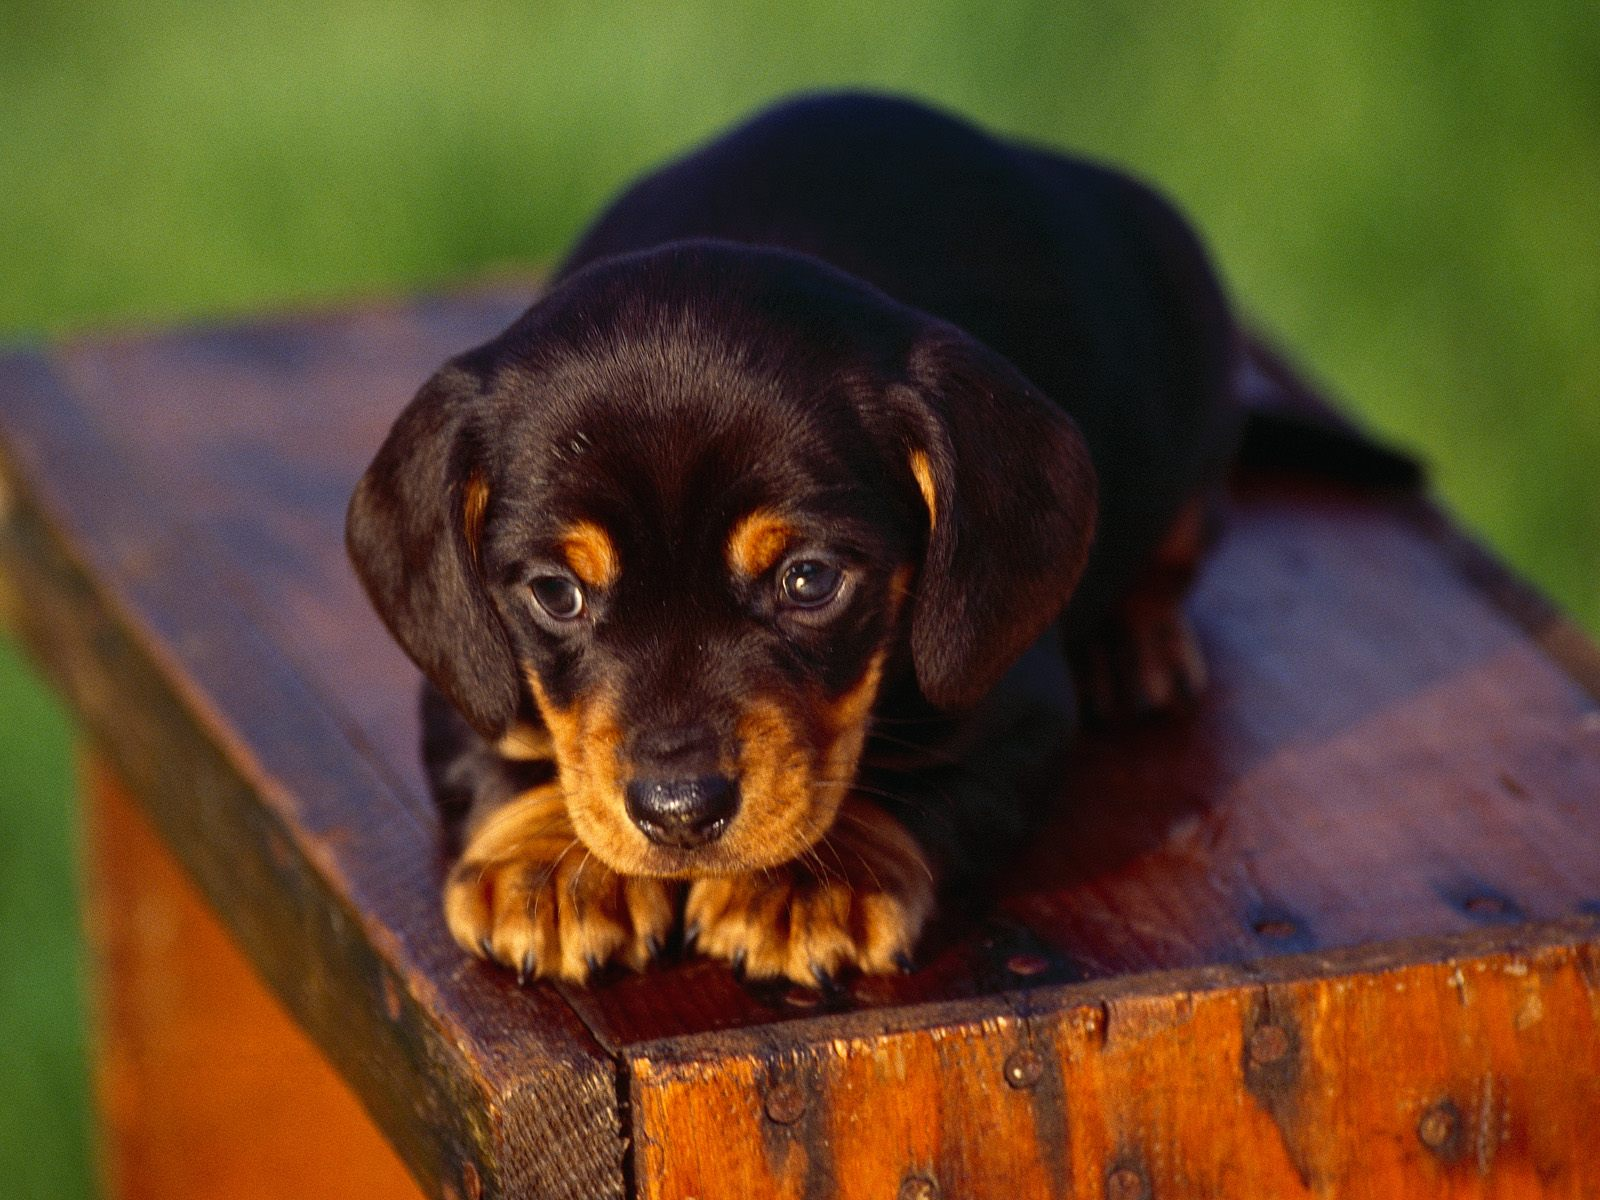 http://2.bp.blogspot.com/_nEmB3Z5F5EM/S62TLaM9VxI/AAAAAAAAISY/2zNKVQdUncQ/s1600/American_Black_and_Tan_Coonhound_puppy.jpg